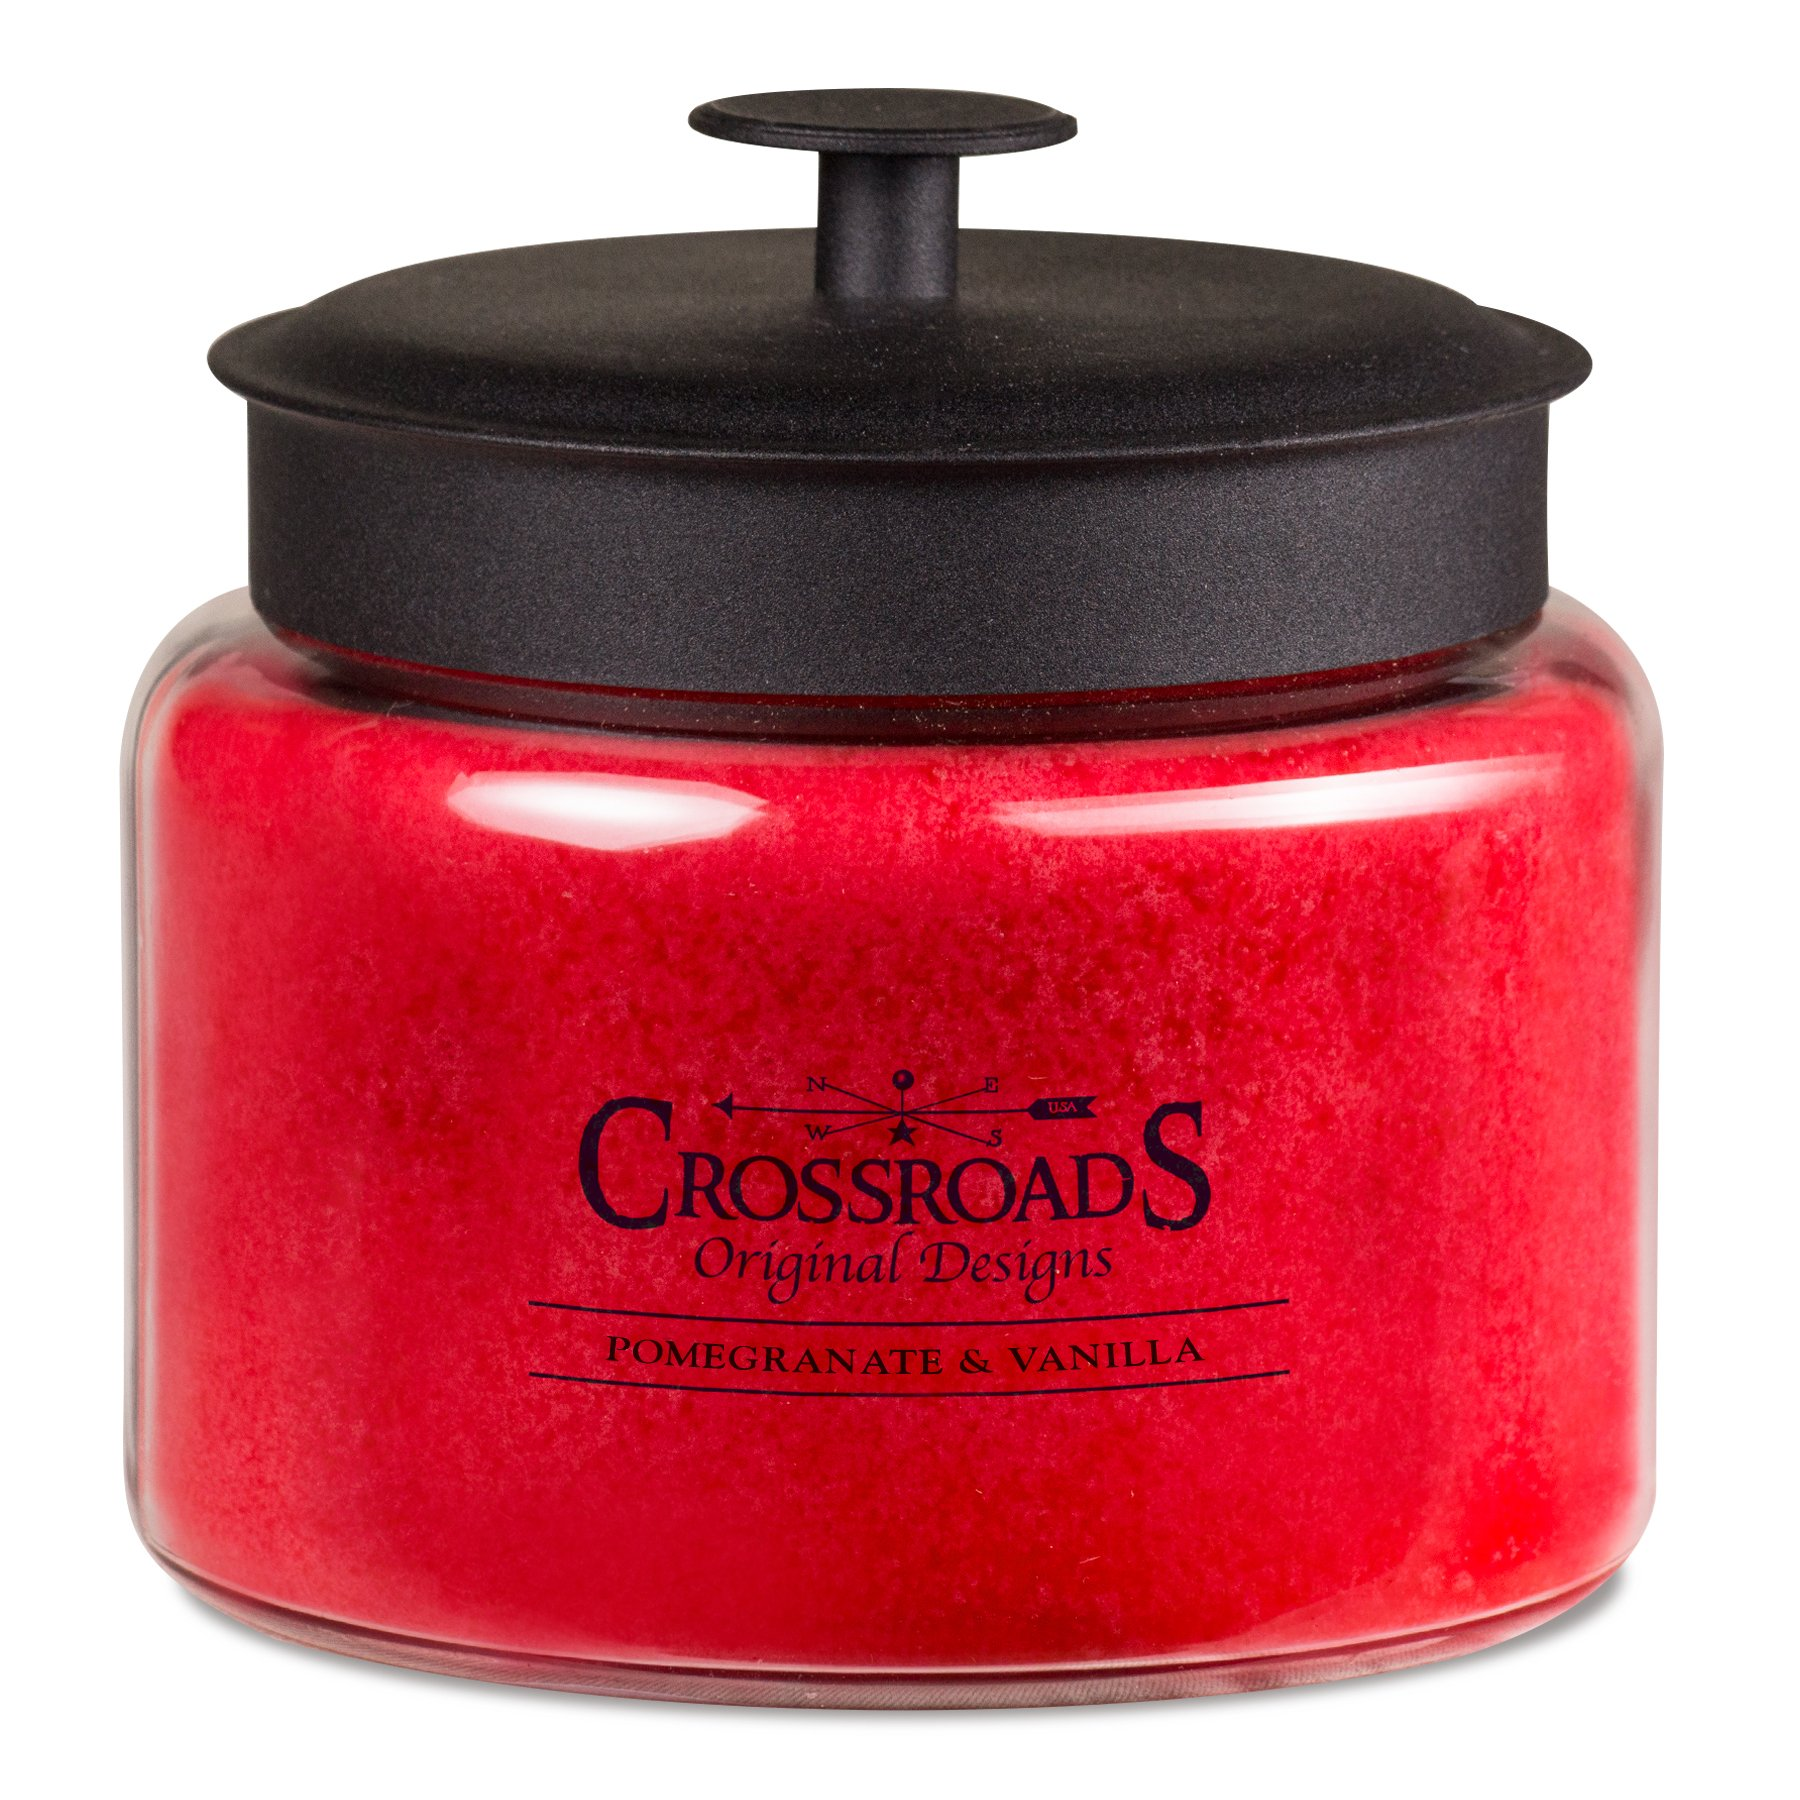 Crossroads Pomegranate & Vanilla Scented 4-Wick Candle, 64 Ounce